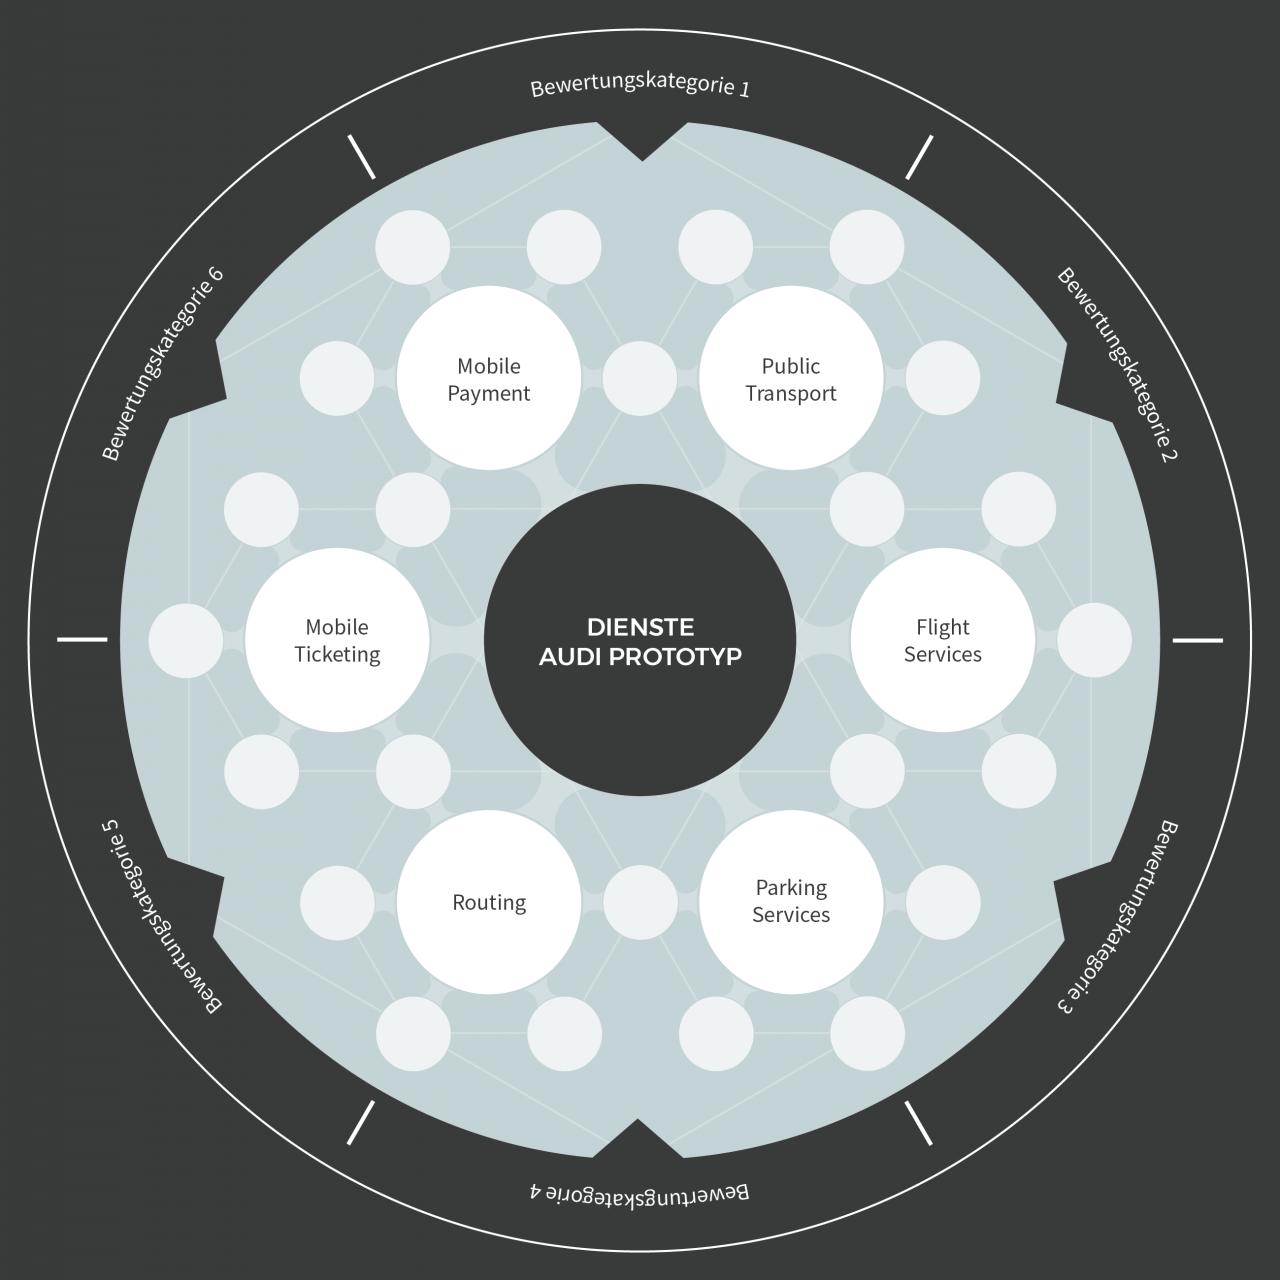 Grafik Dienste in Audi Prototyp